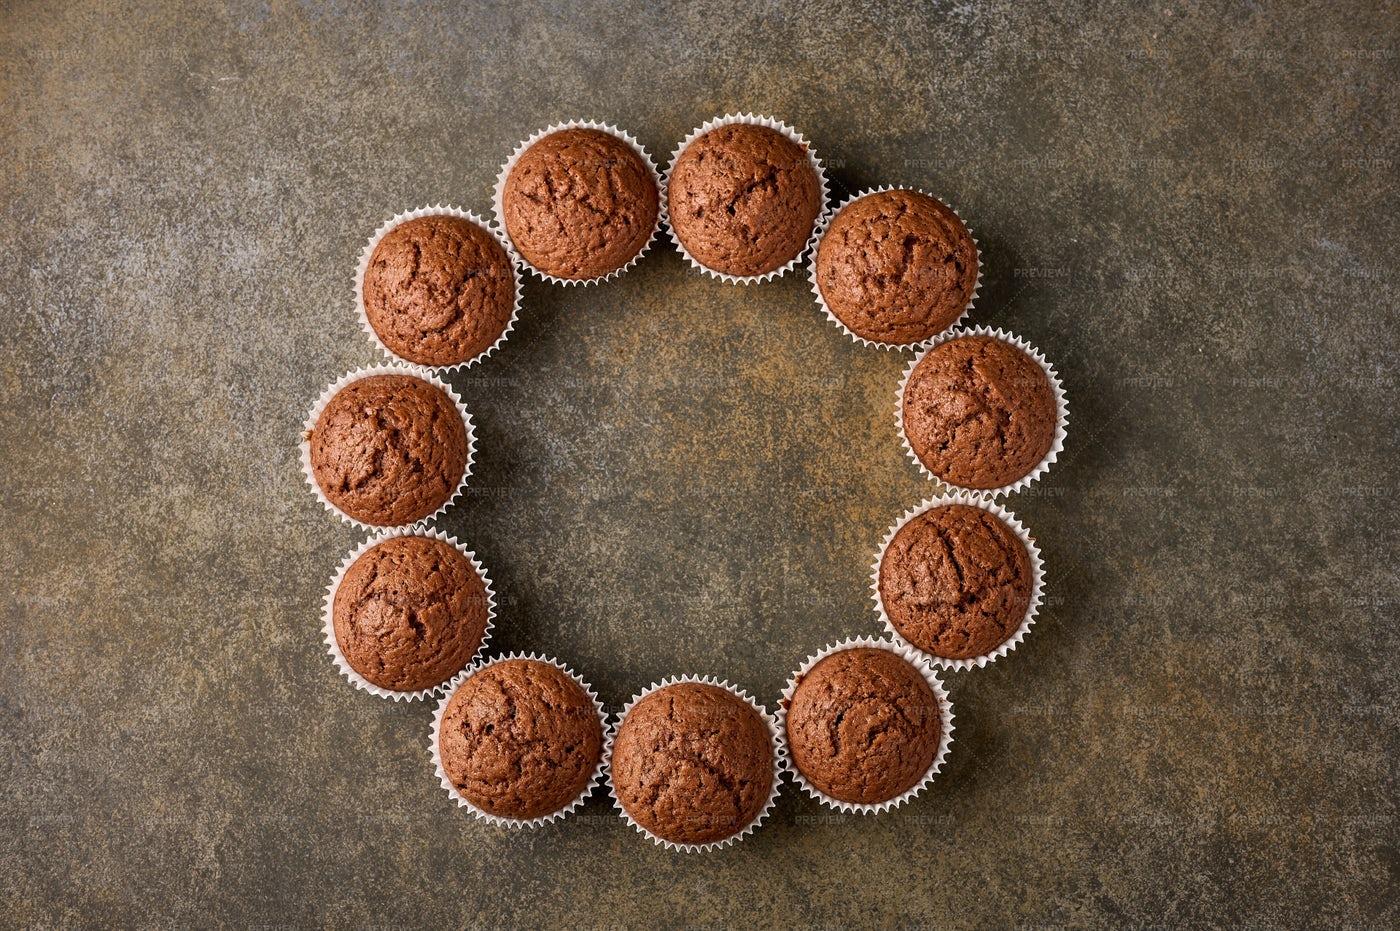 Chocolate Cupcakes In Circle: Stock Photos